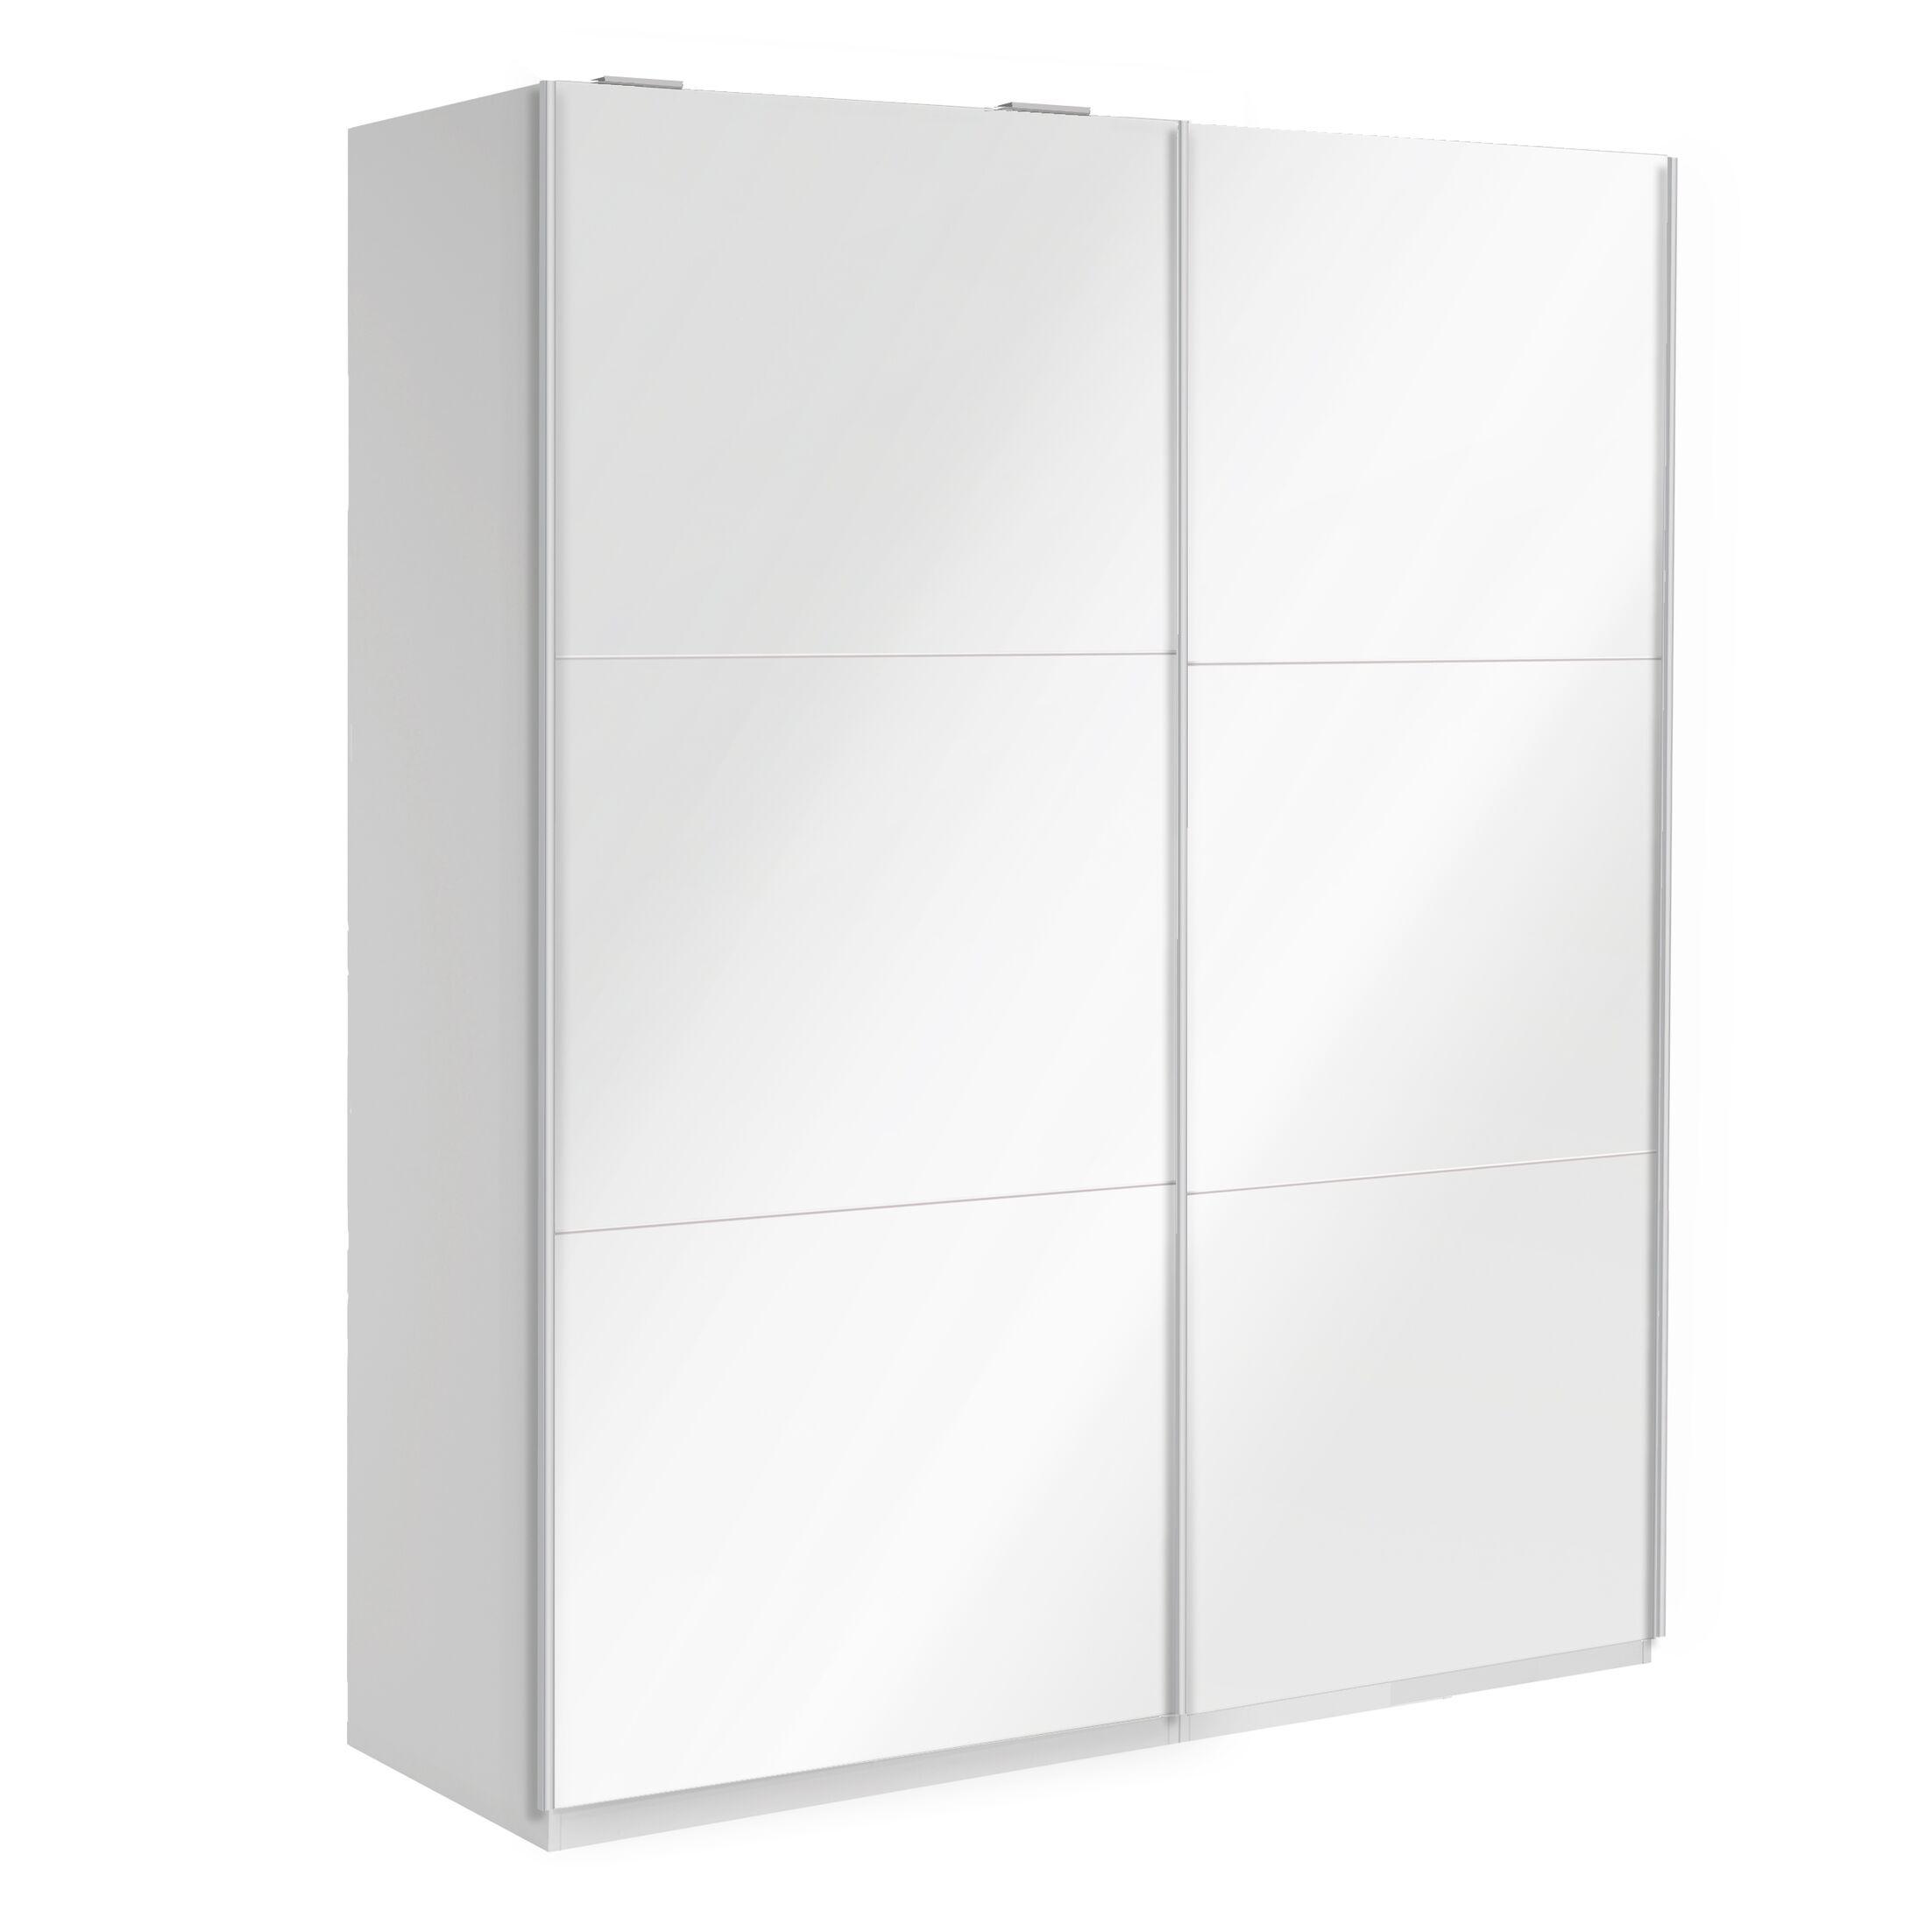 Optimeo Armoire Color: White Gloss